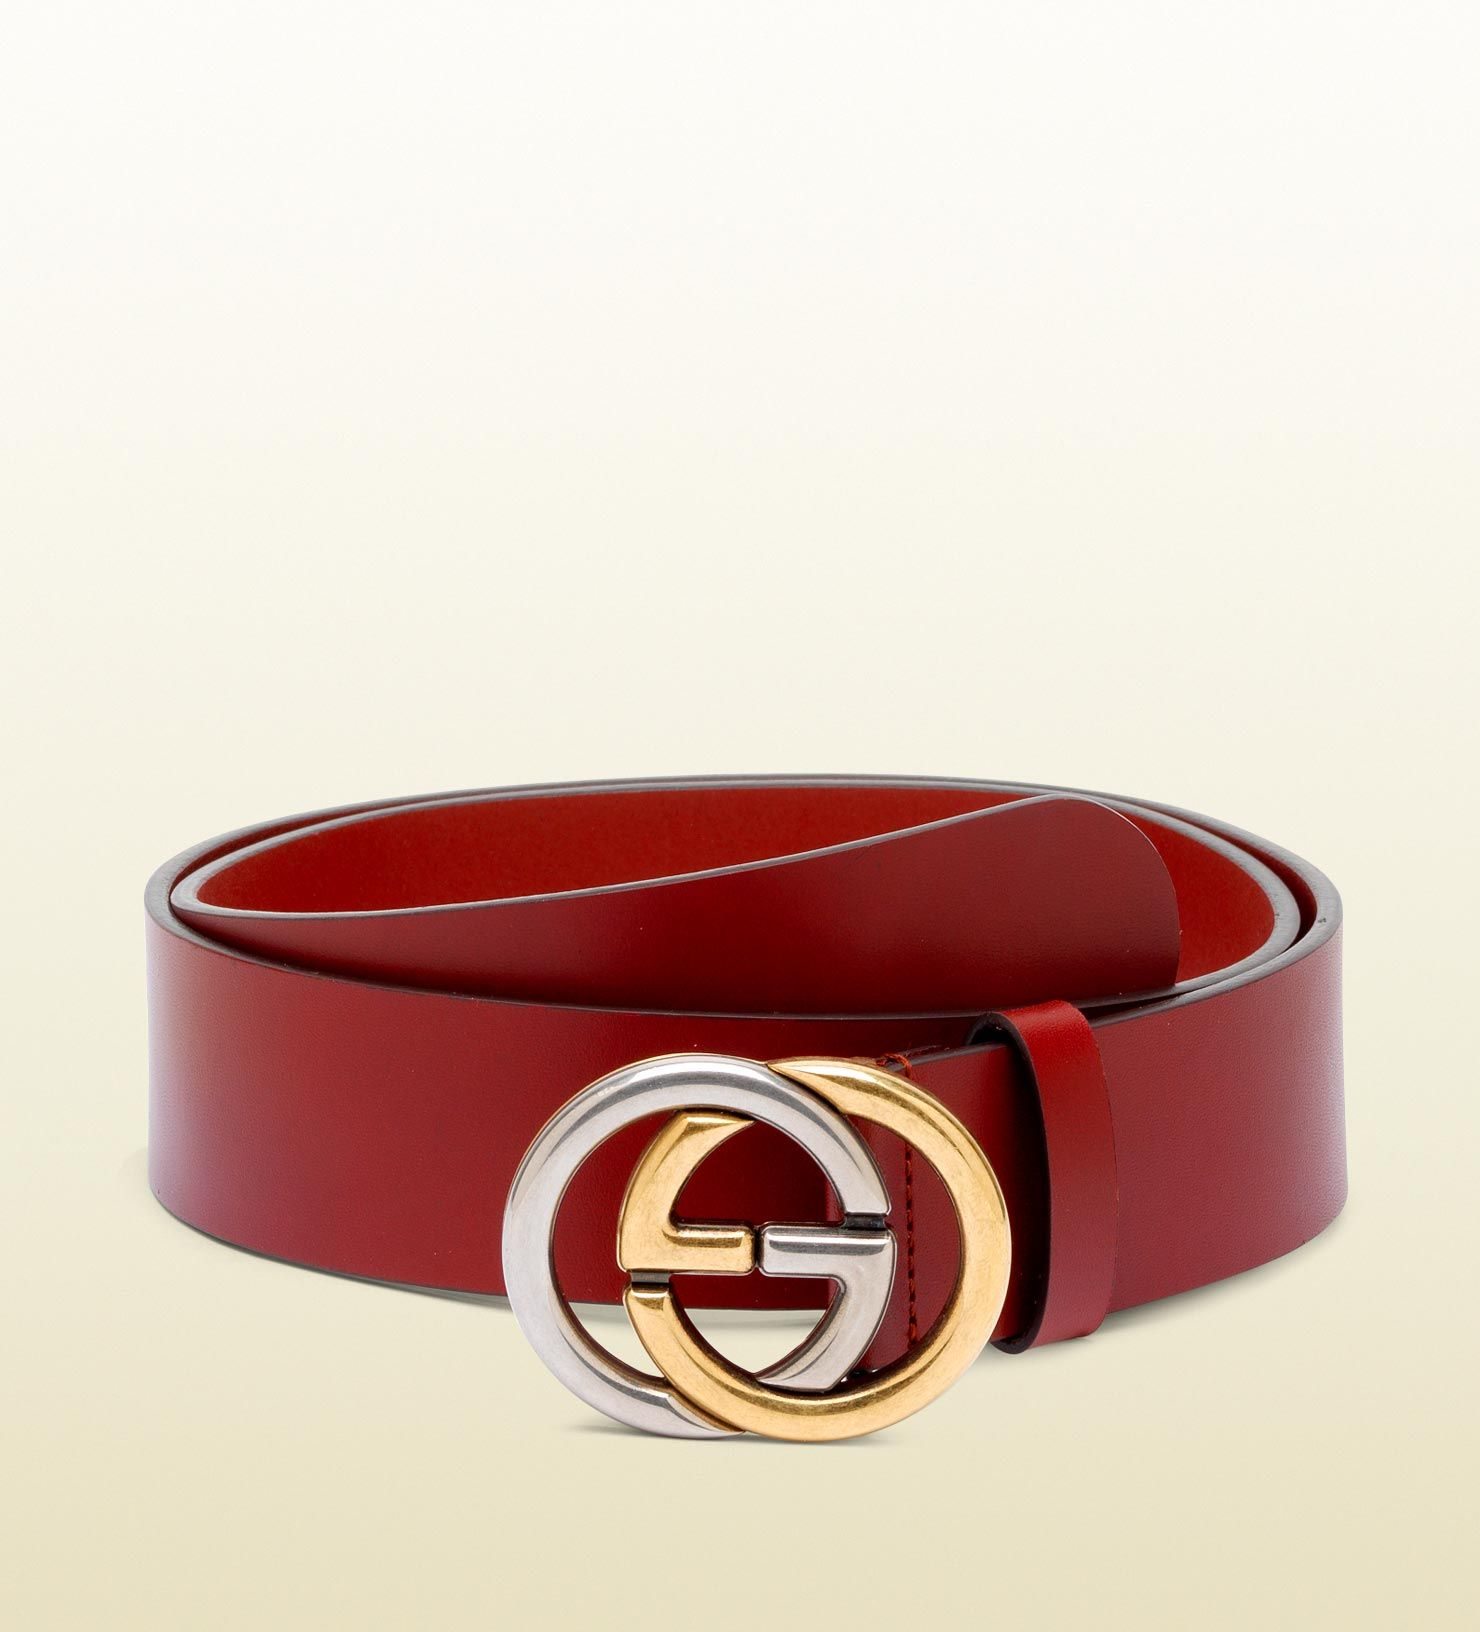 7f29d7c54c5e6 Men's Red Belt with Bicolor Interlocking G Buckle | Red Belt | Red ...